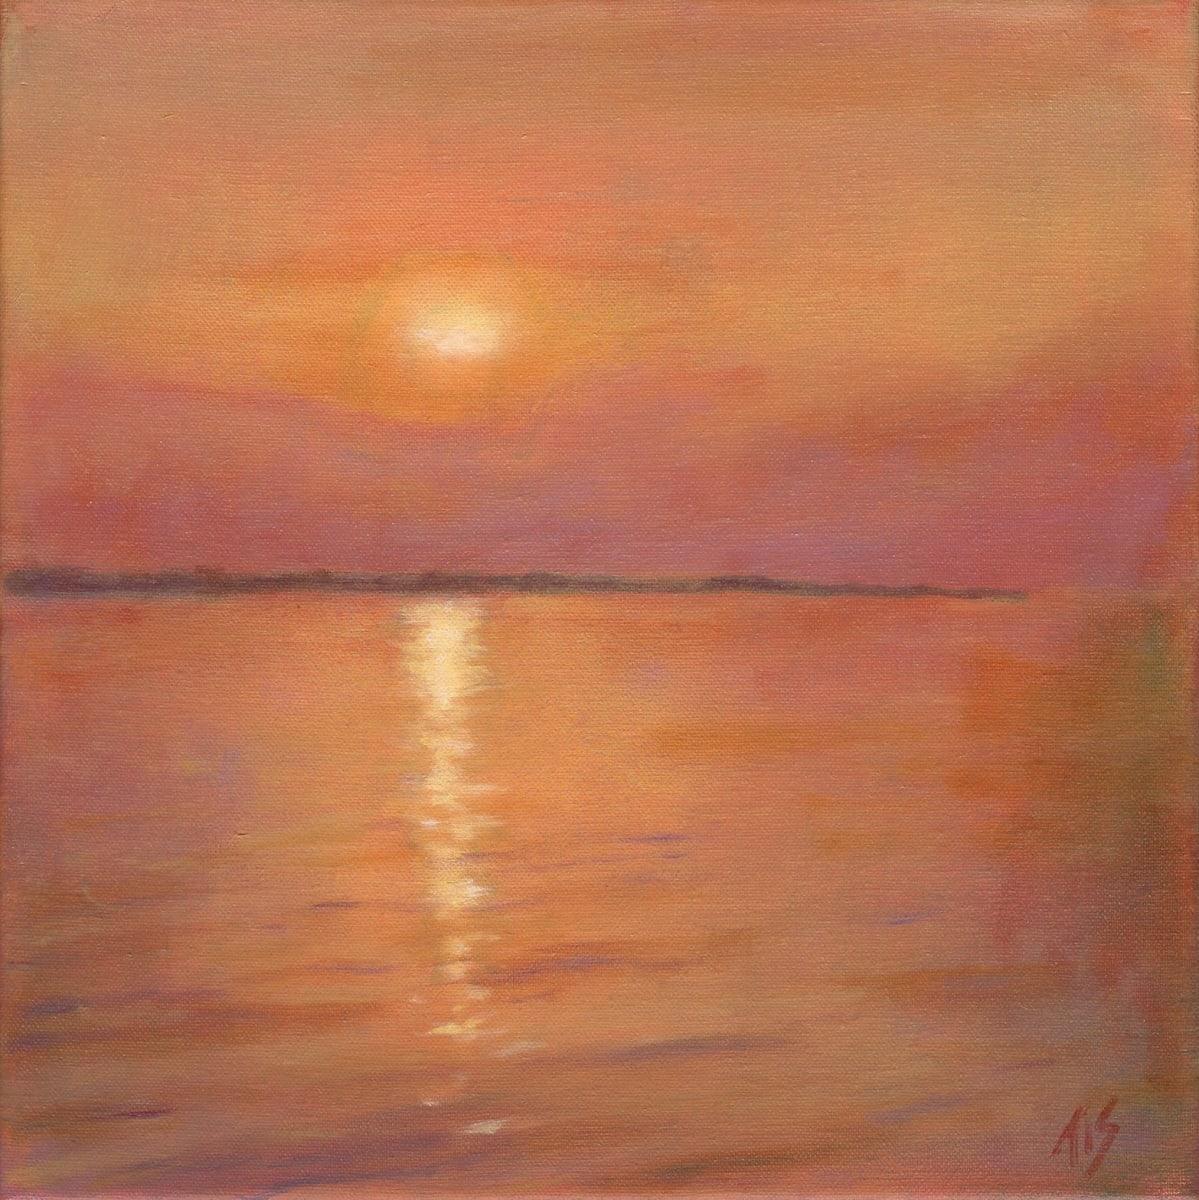 Rappahannock Sunset 37.750833N 76.6375W by Thomas Stevens